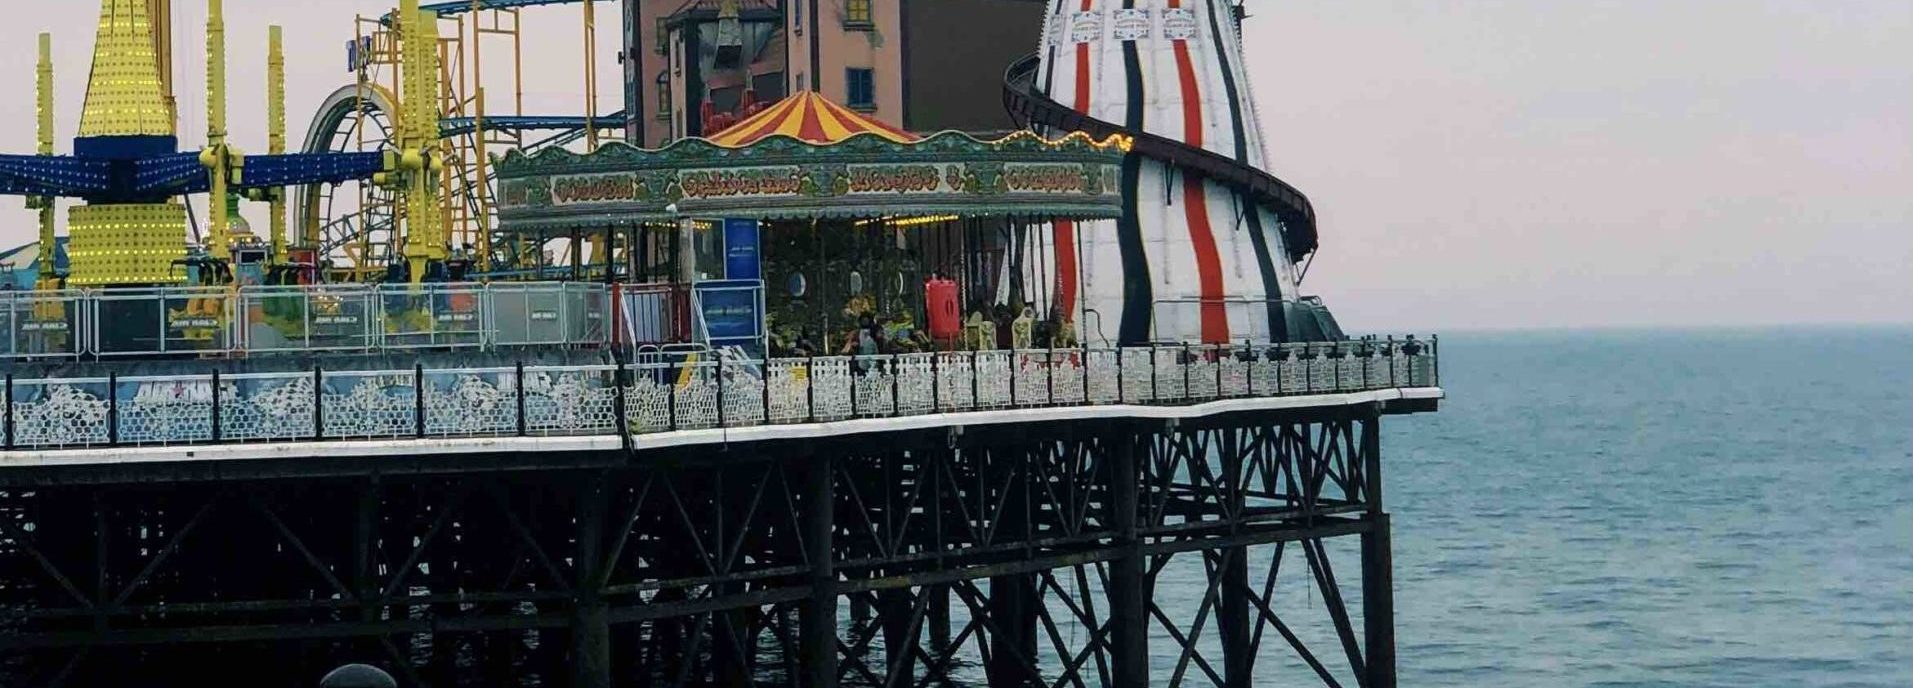 UK Staycation in Brighton